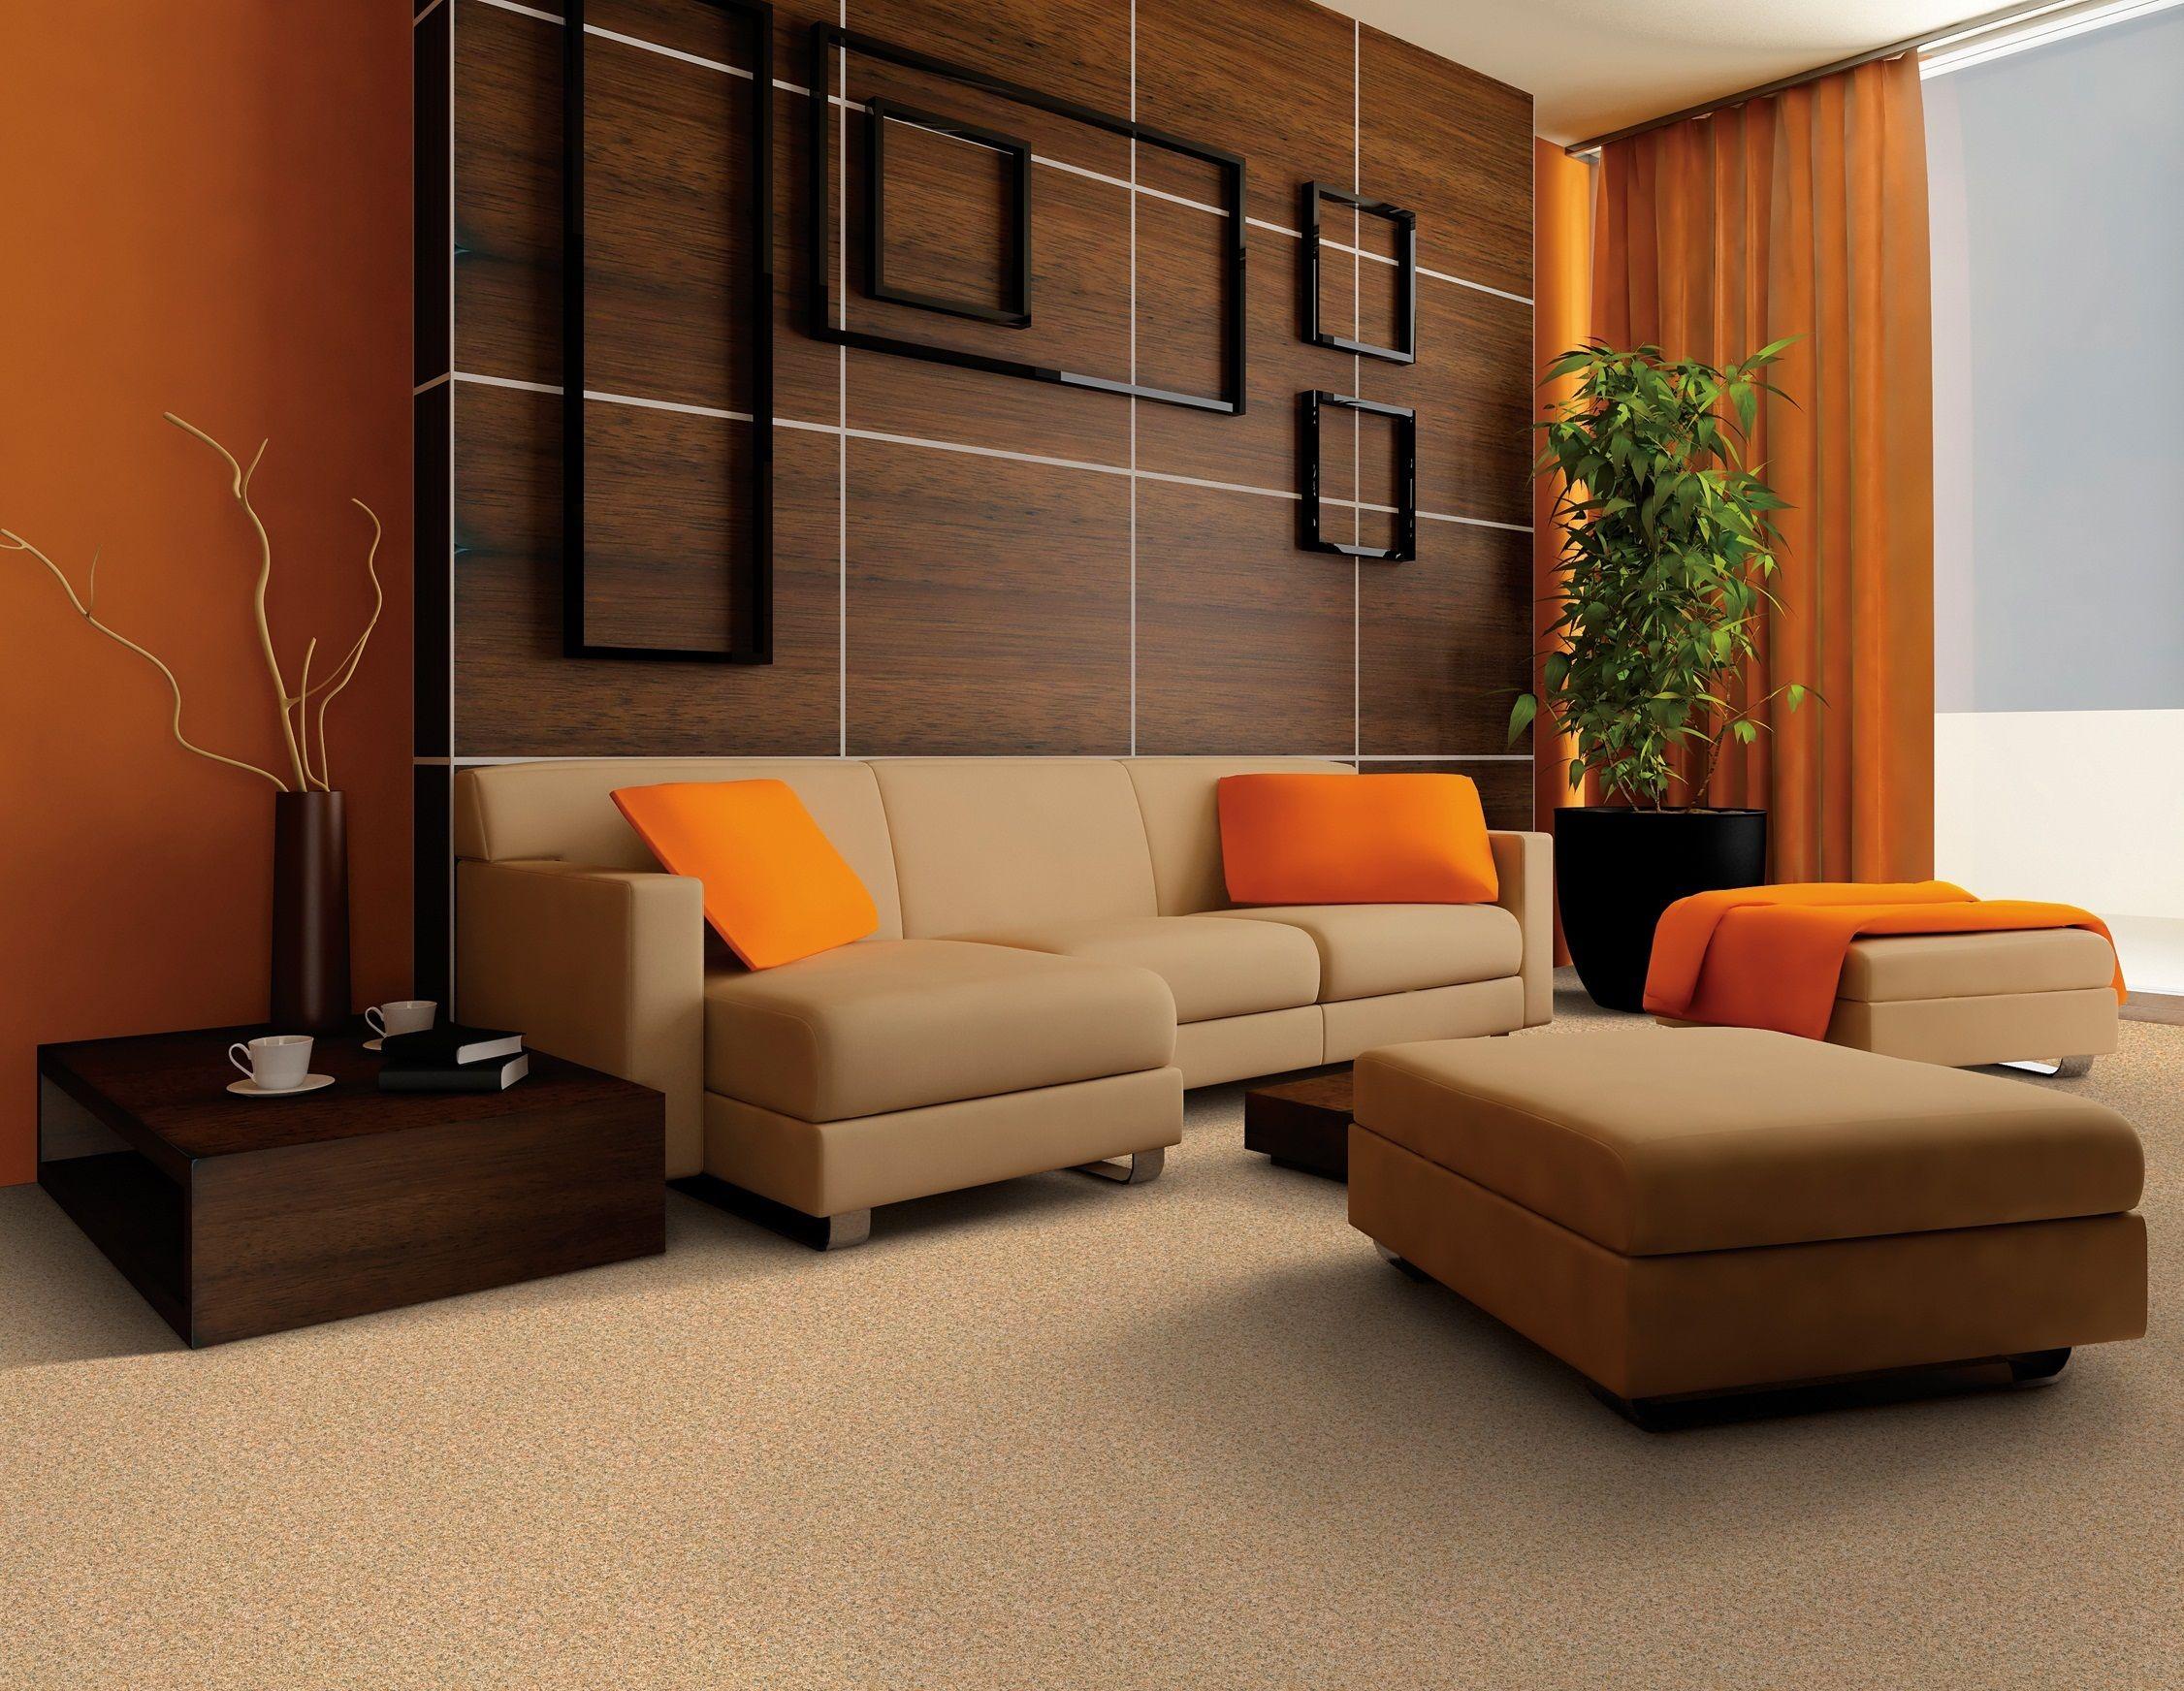 Colors To Brighten Up A Bedroom Home Delightful Living Room Orange Living Room Color Schemes Minimalist Living Room